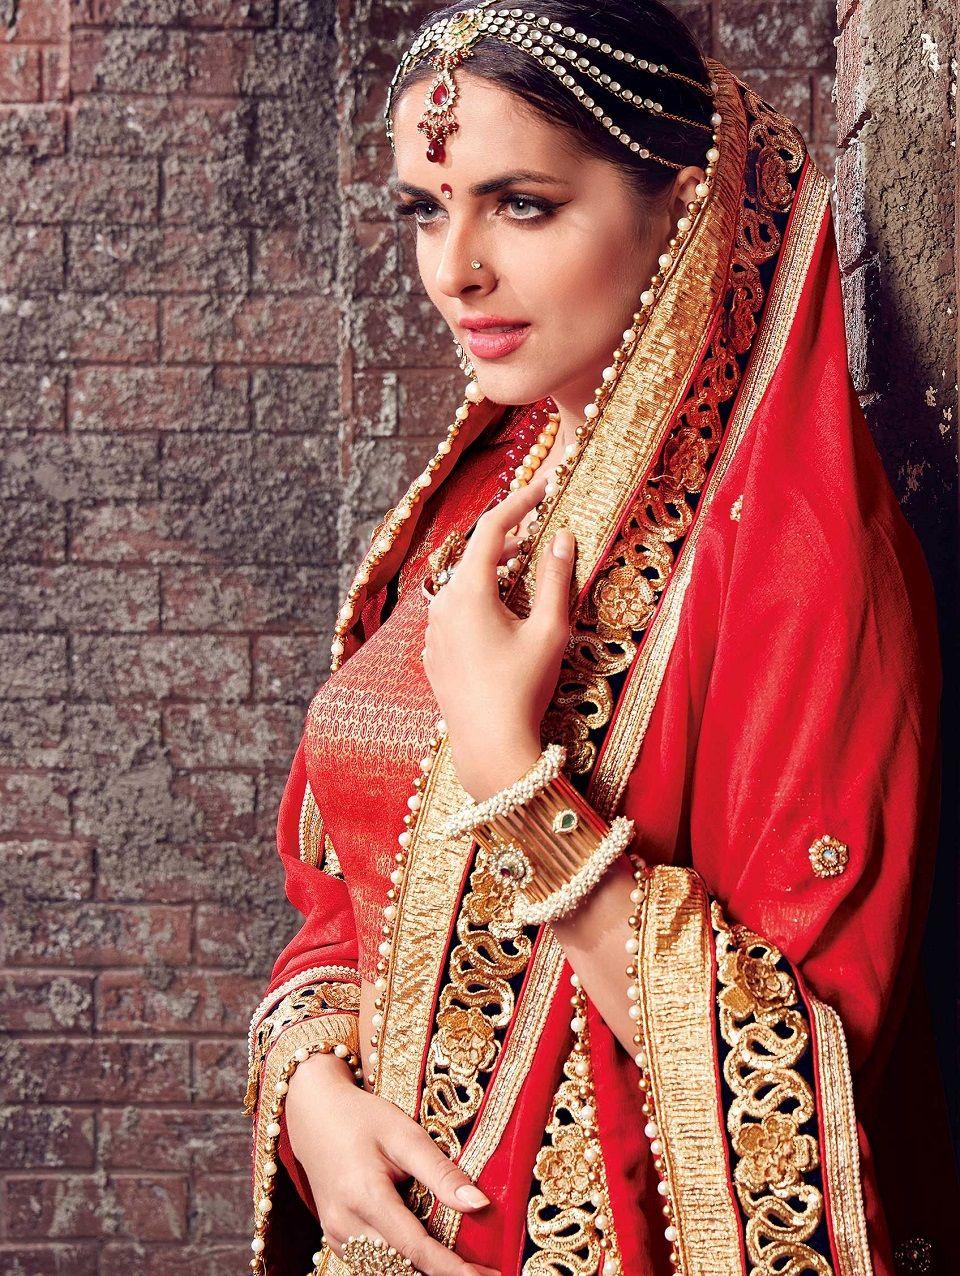 Indian Wedding Saree Latest Designs & Trends 20202021